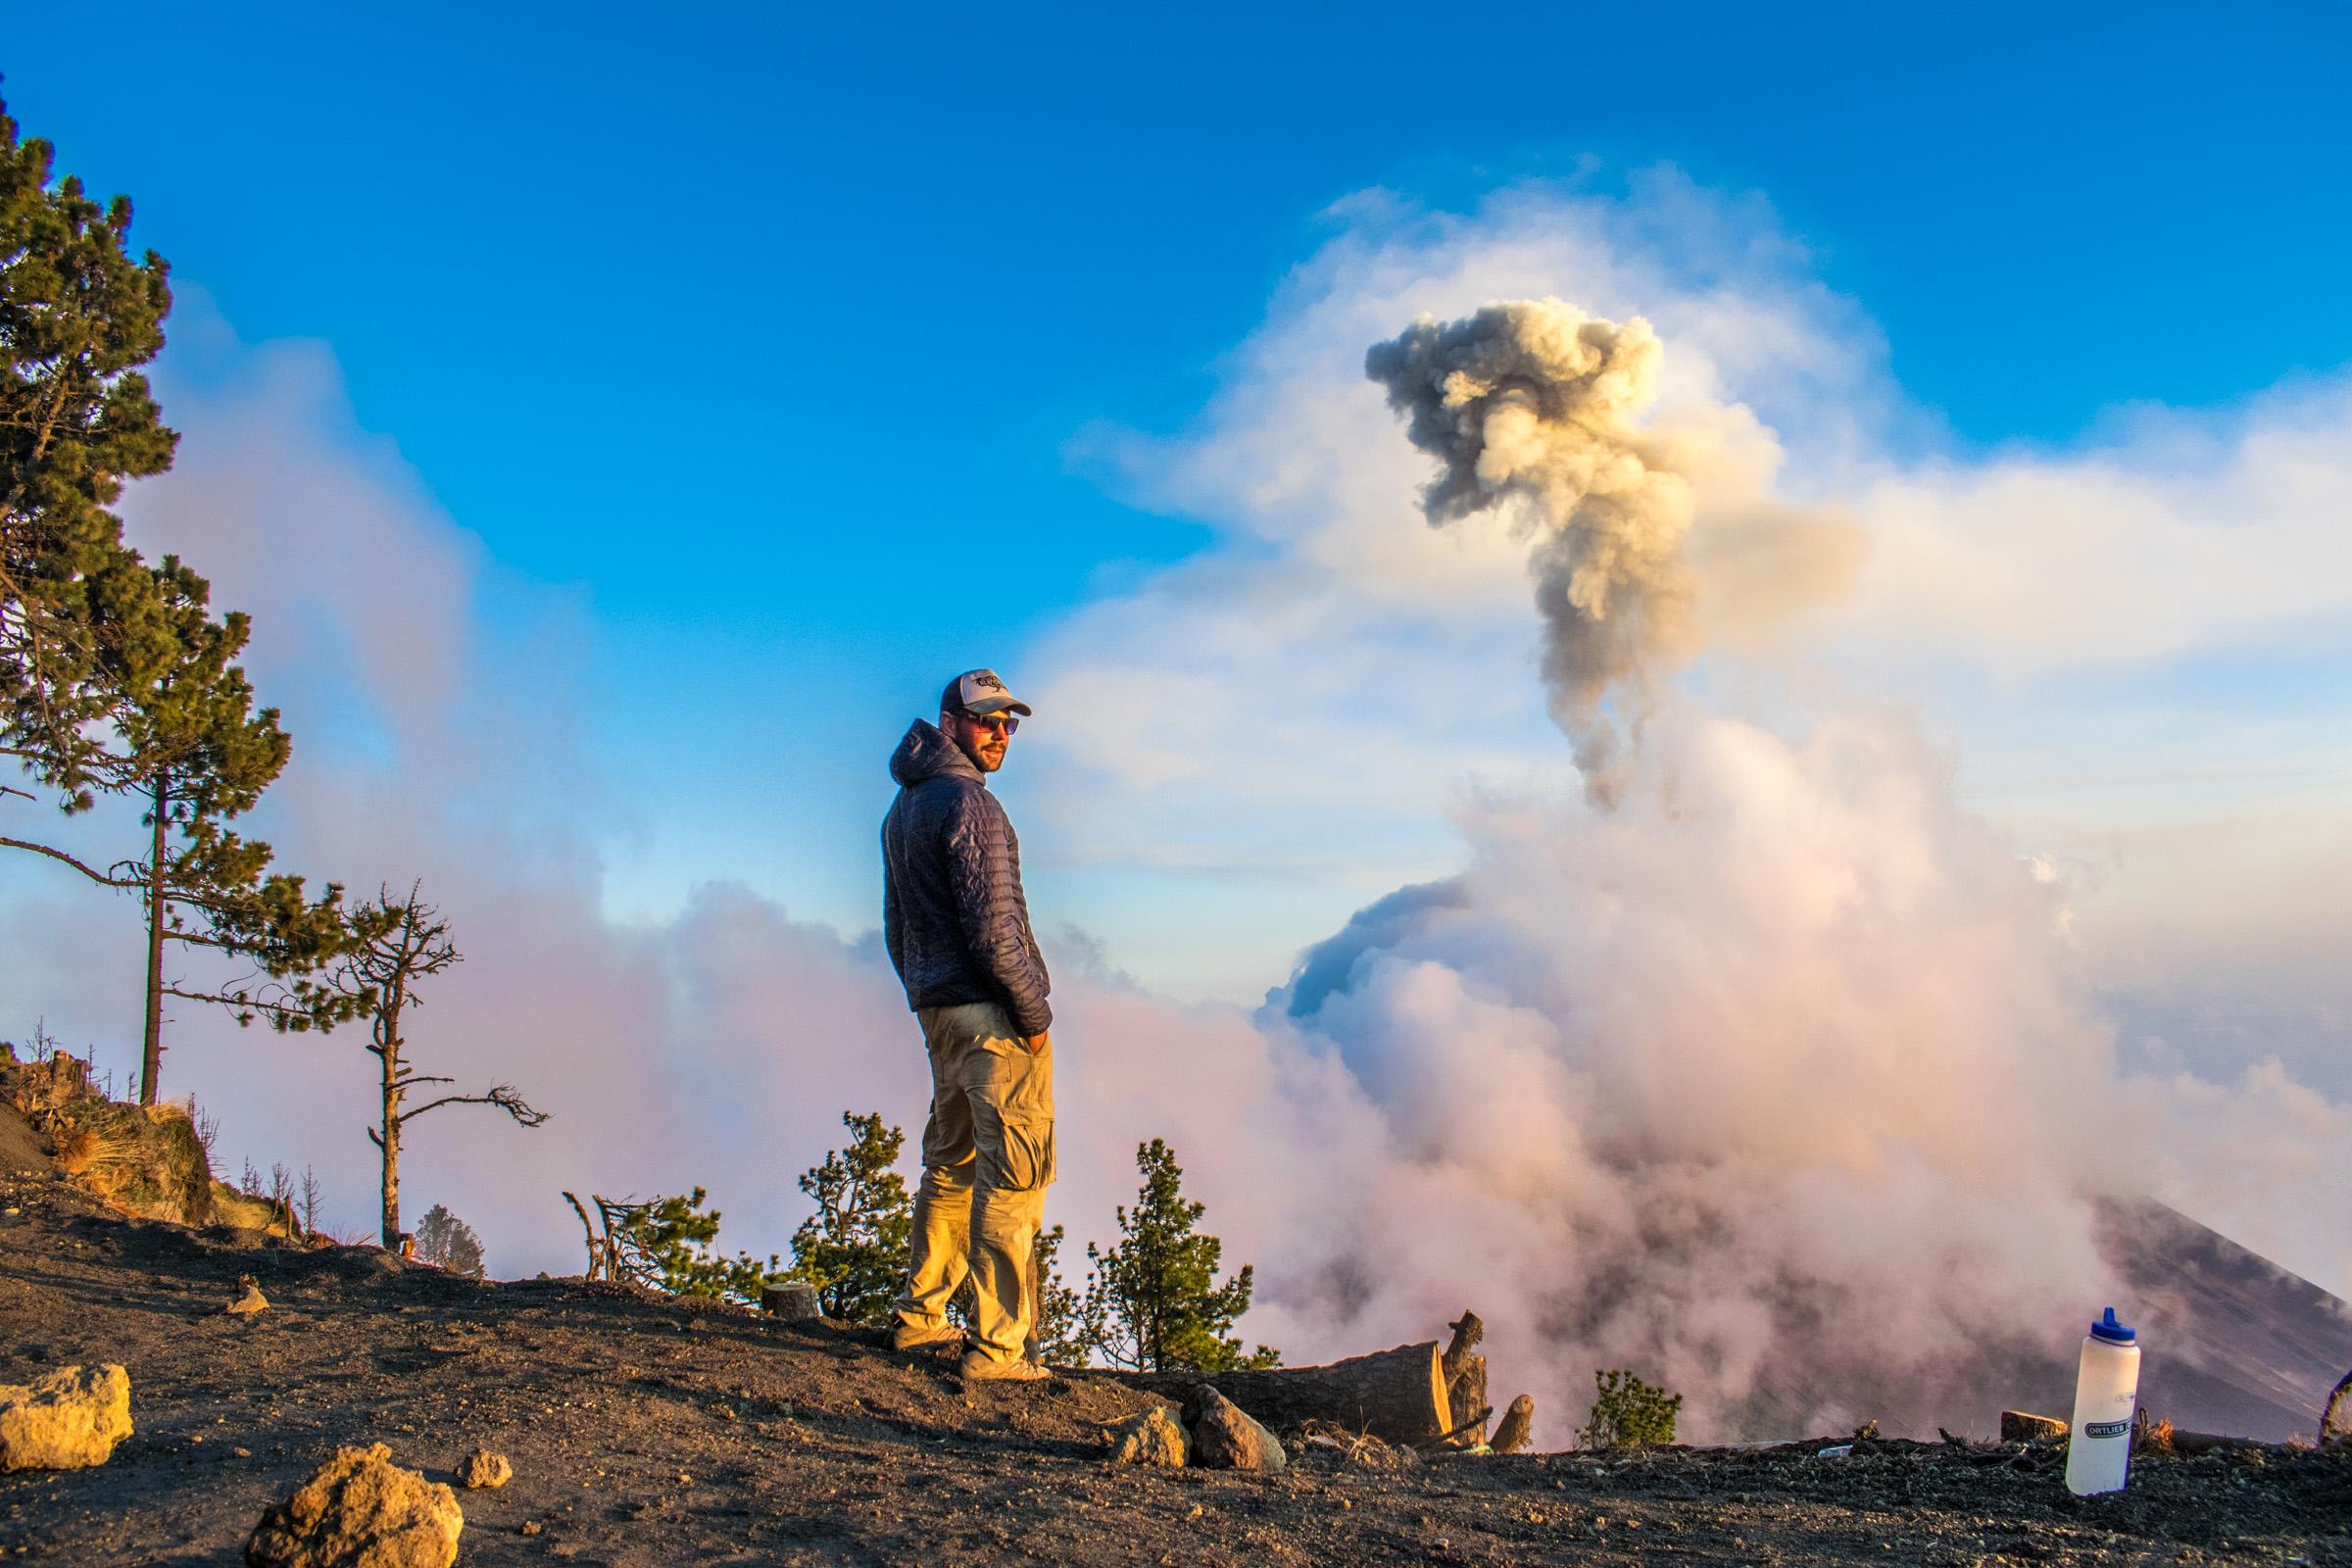 Chasing volcanoes